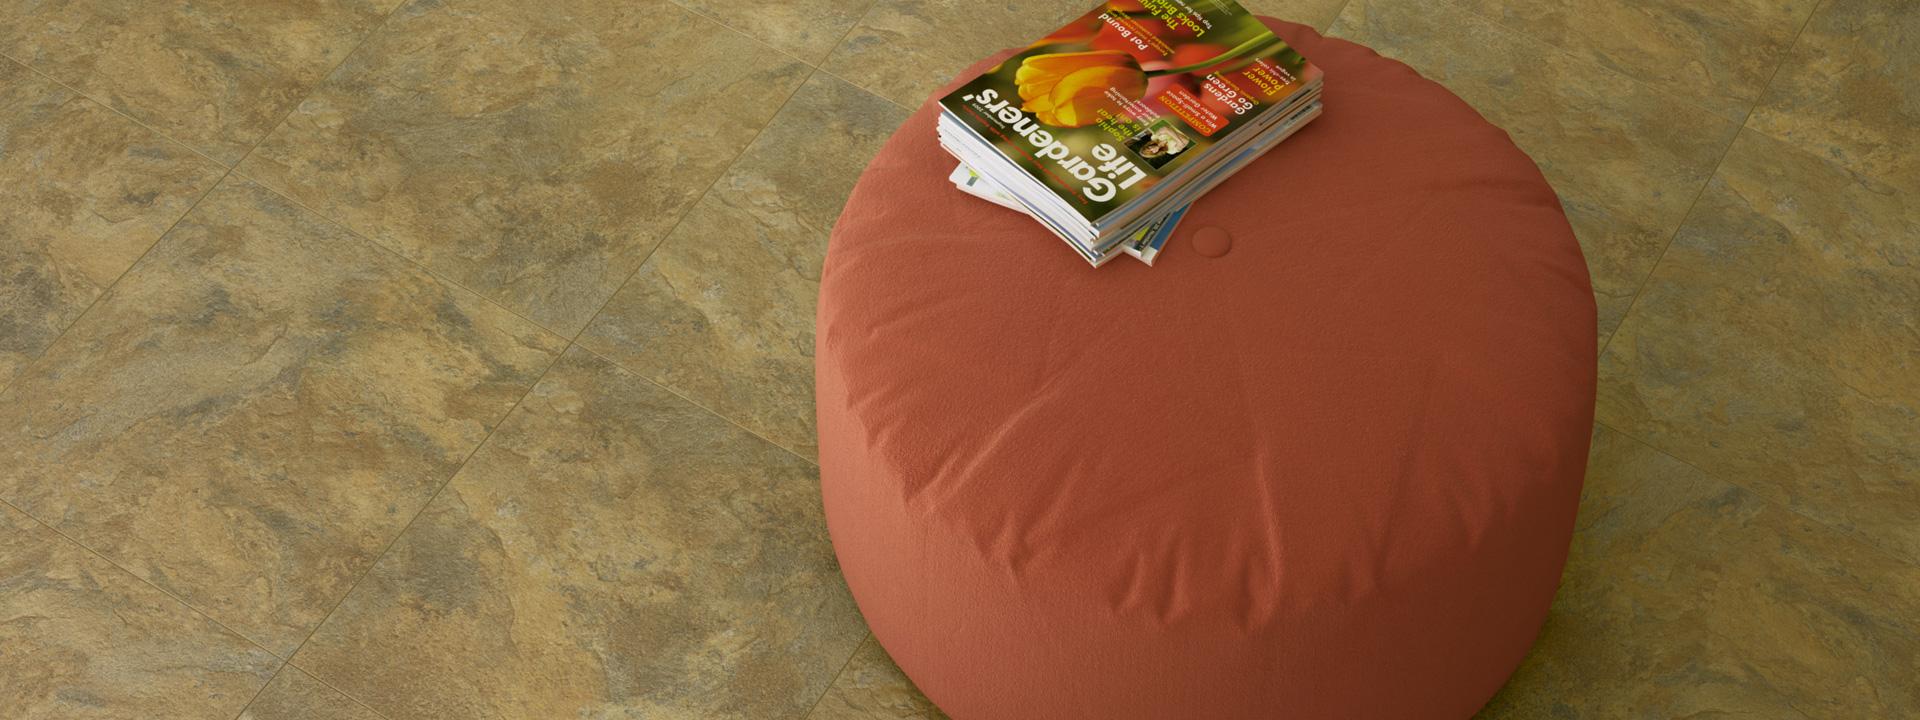 American Biltrite Flooring